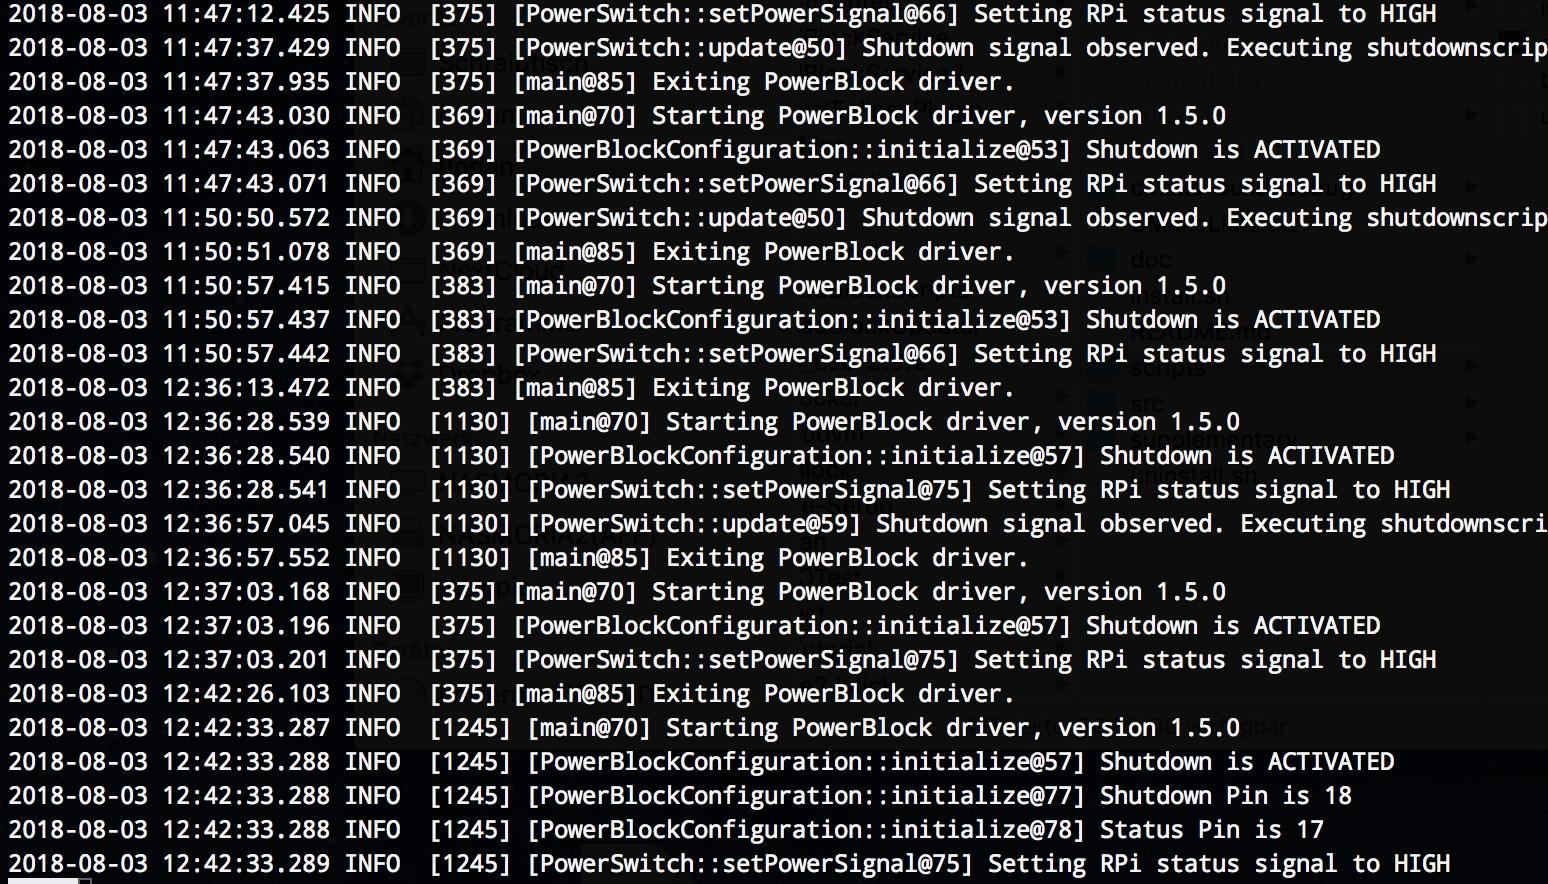 PowerBlock Logging Messages